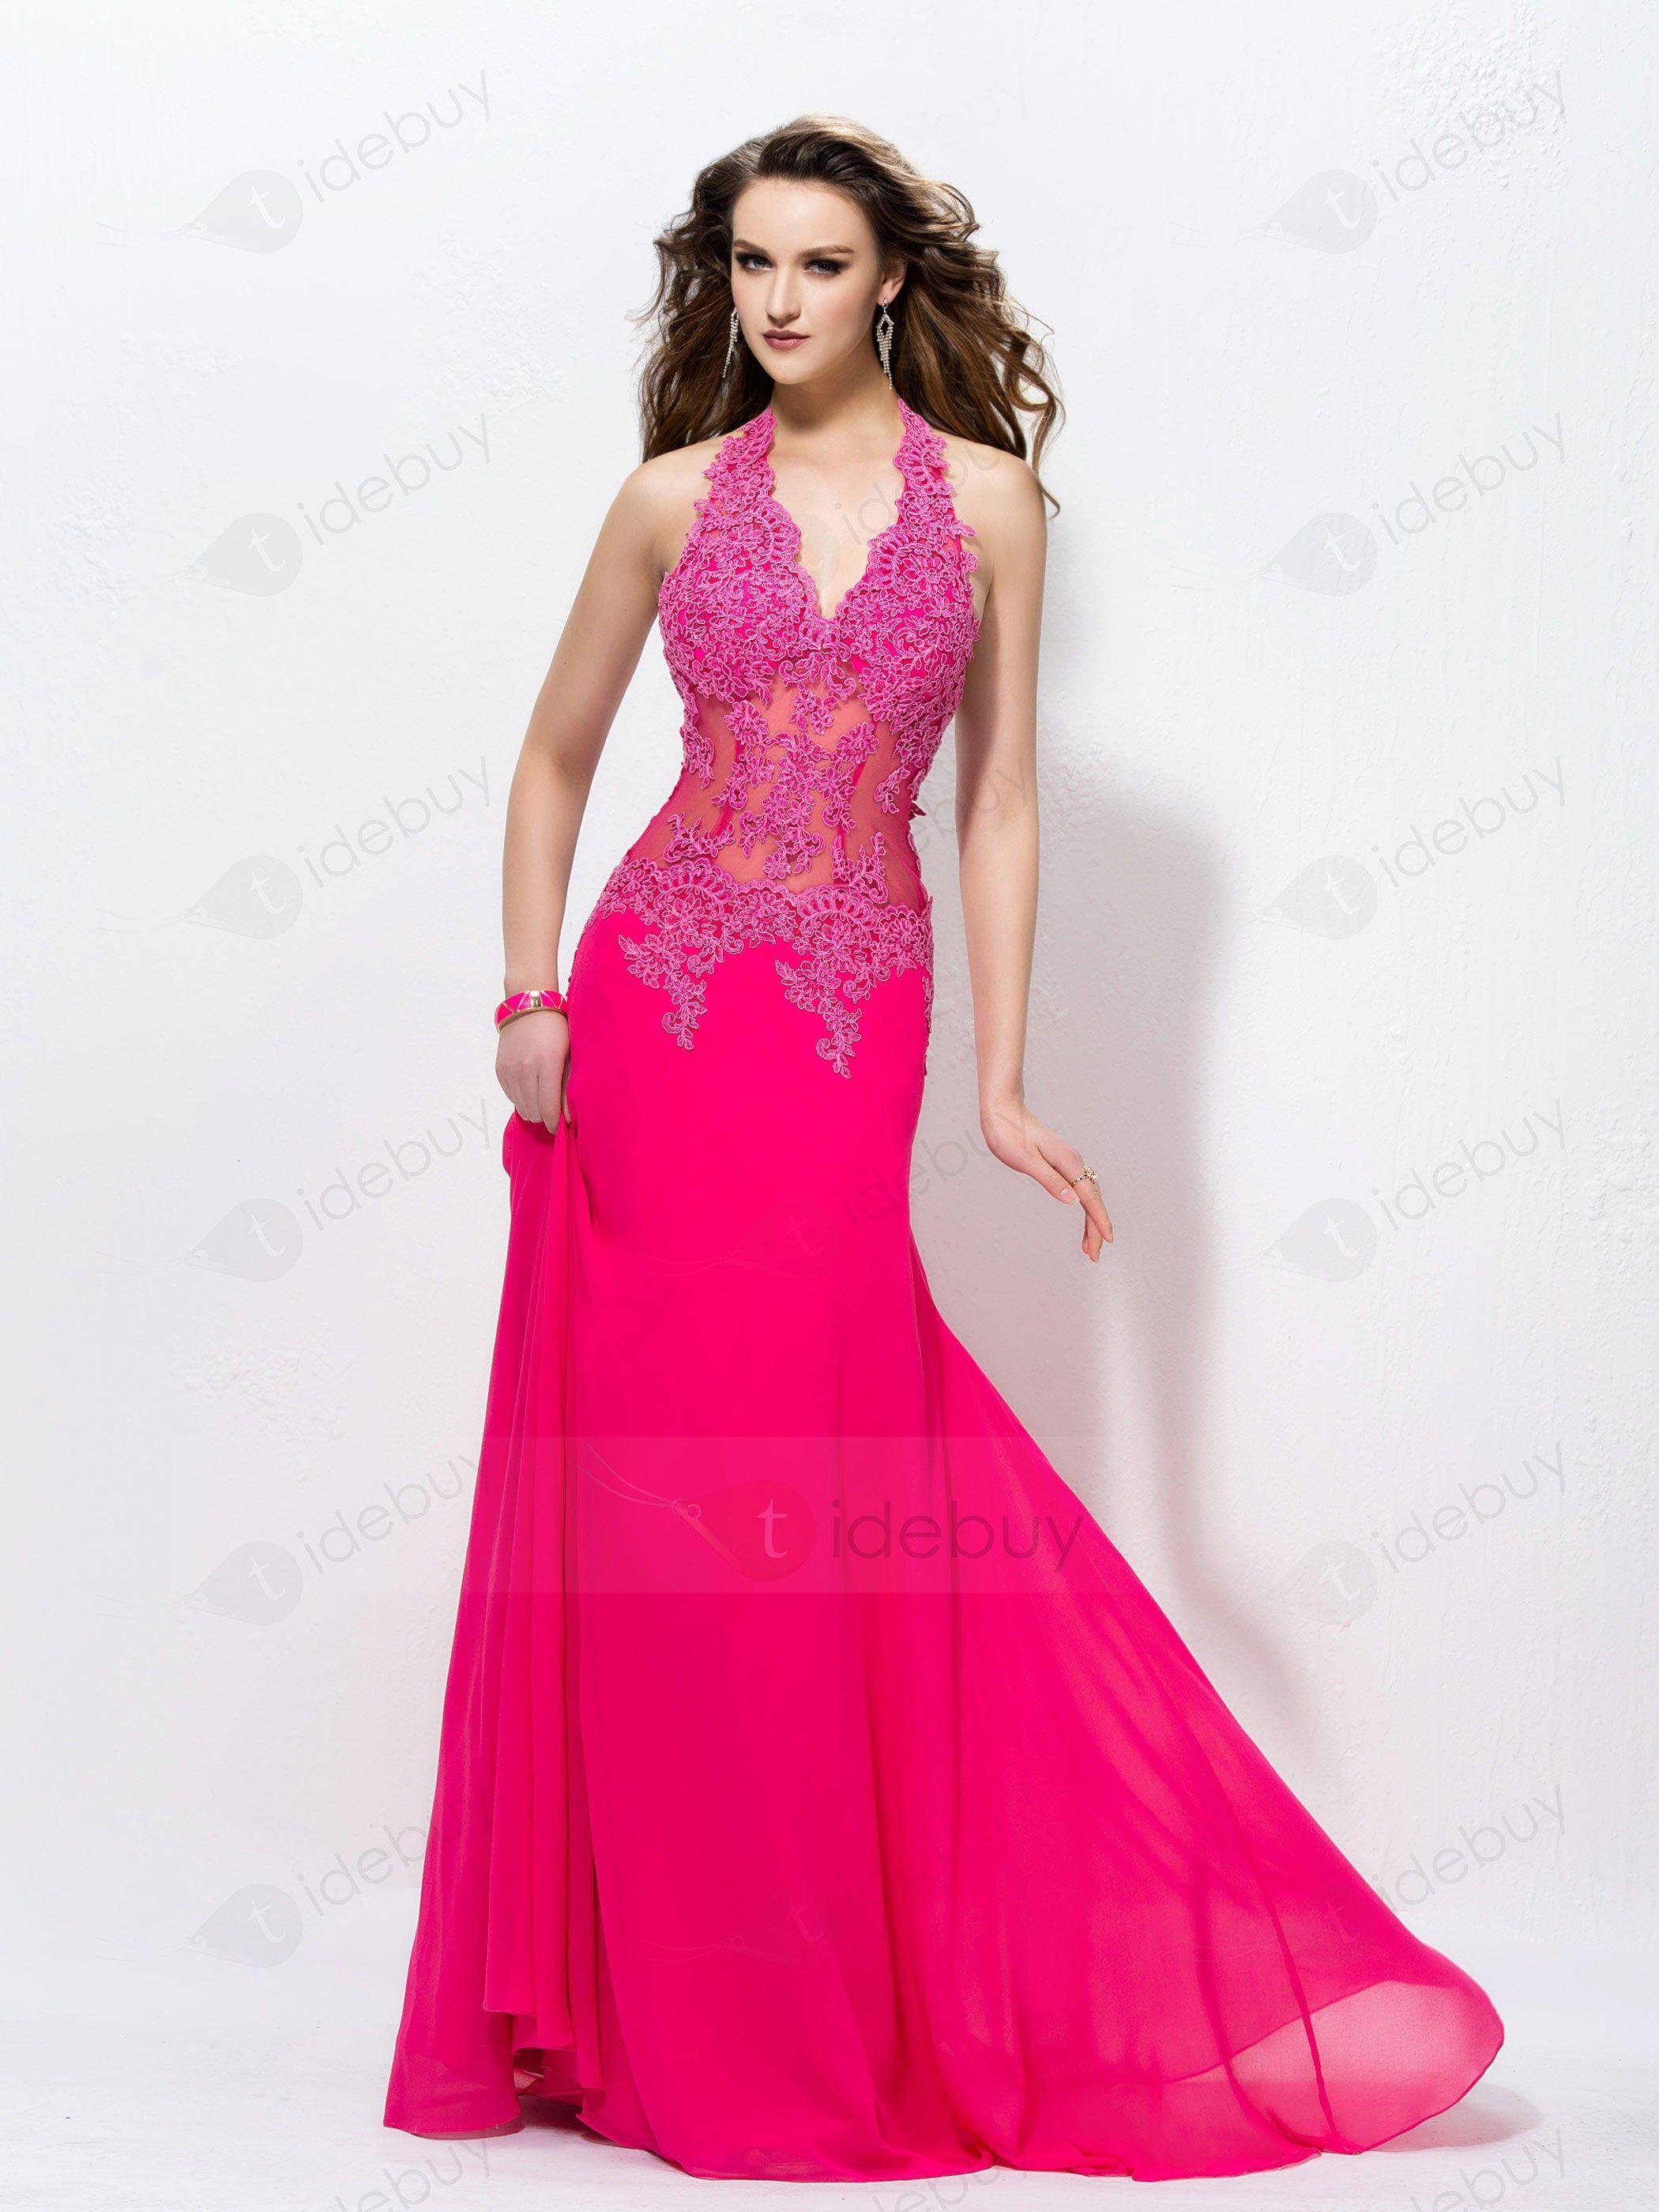 Pin de Valerie Hayward en ☆Sexi lil dresses!!!☆ | Pinterest ...